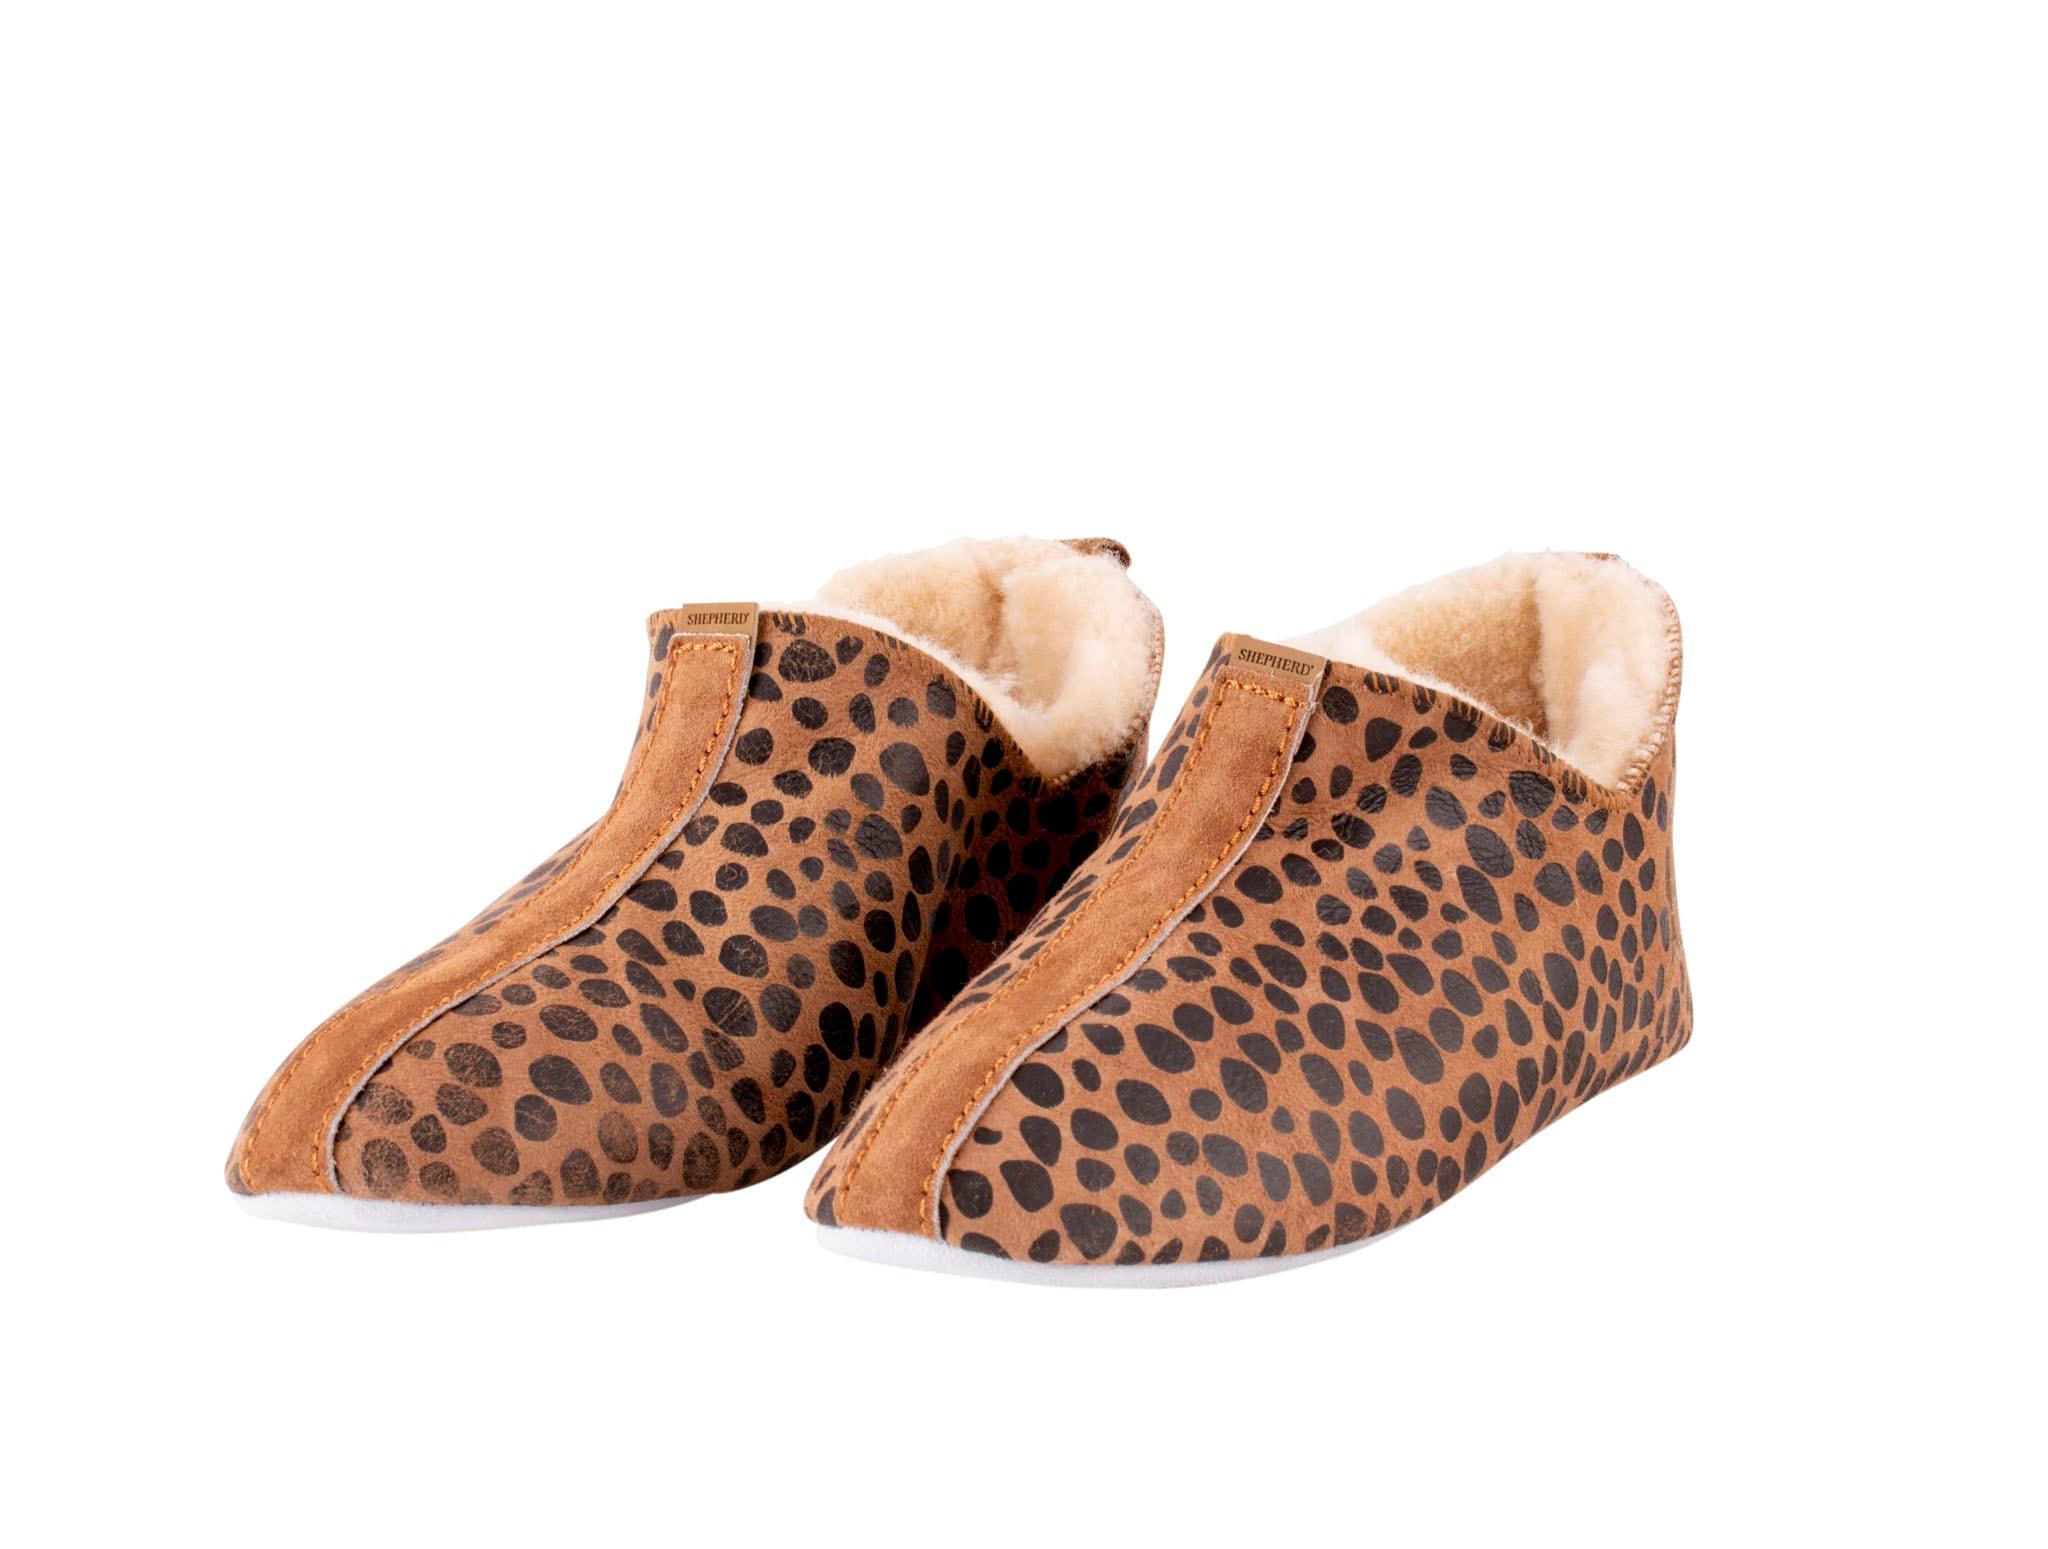 Lina sheepskin slippers Leopard